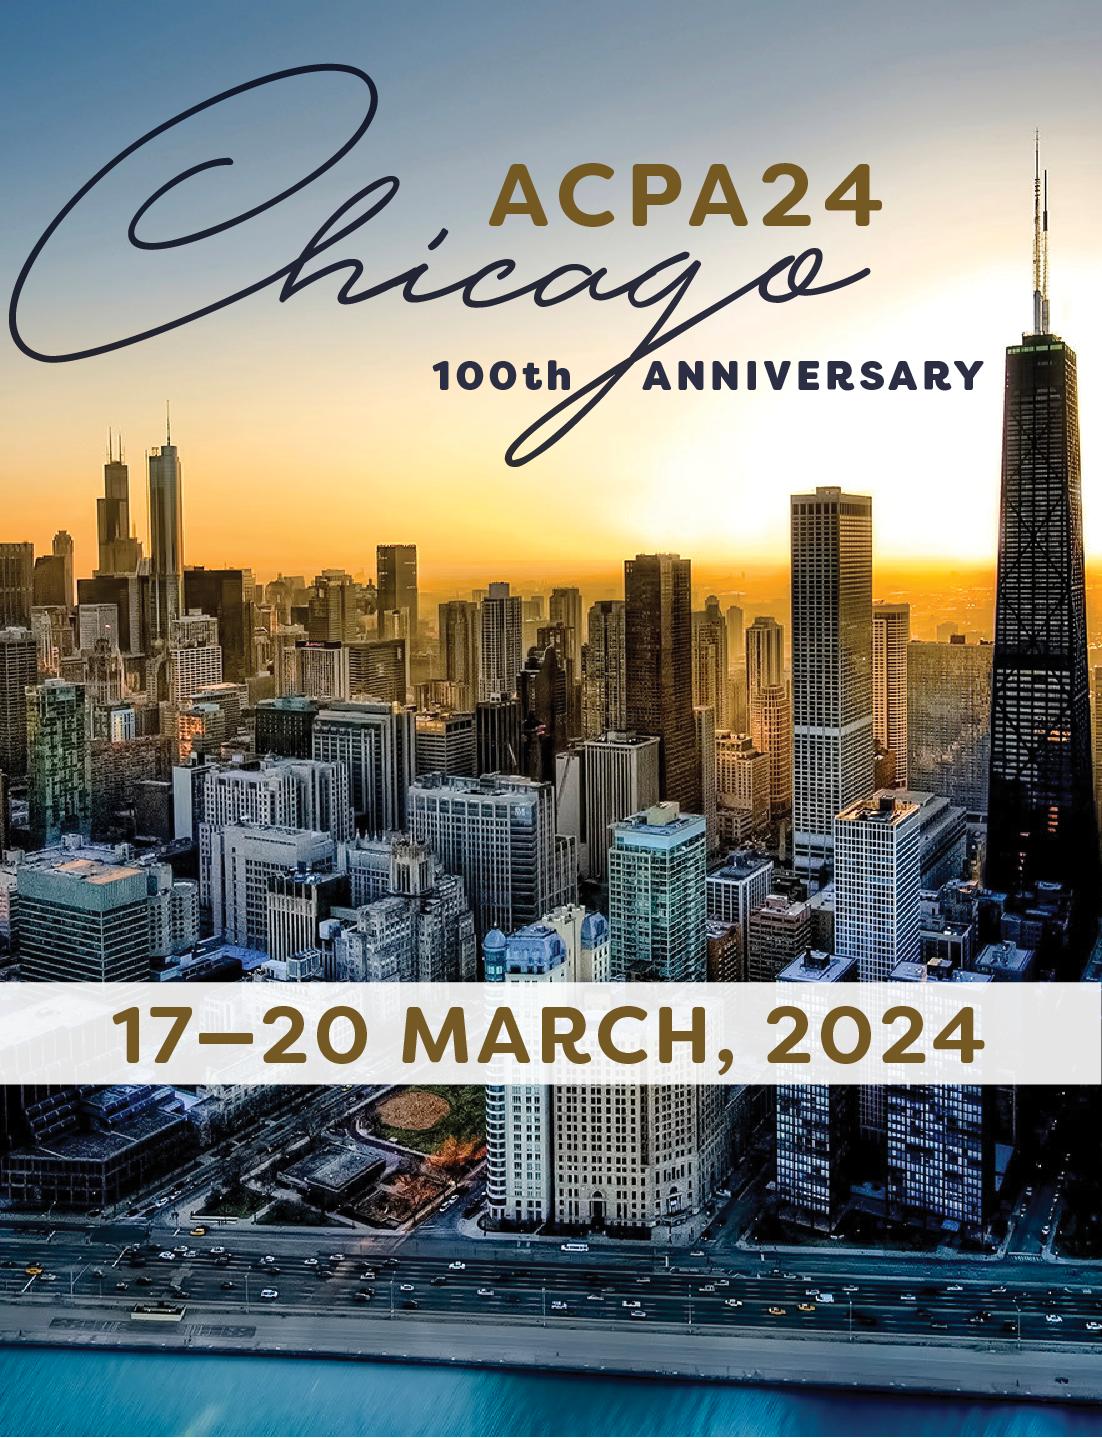 ACPA24 Chicago 100th Anniversary 17-20 March 2024